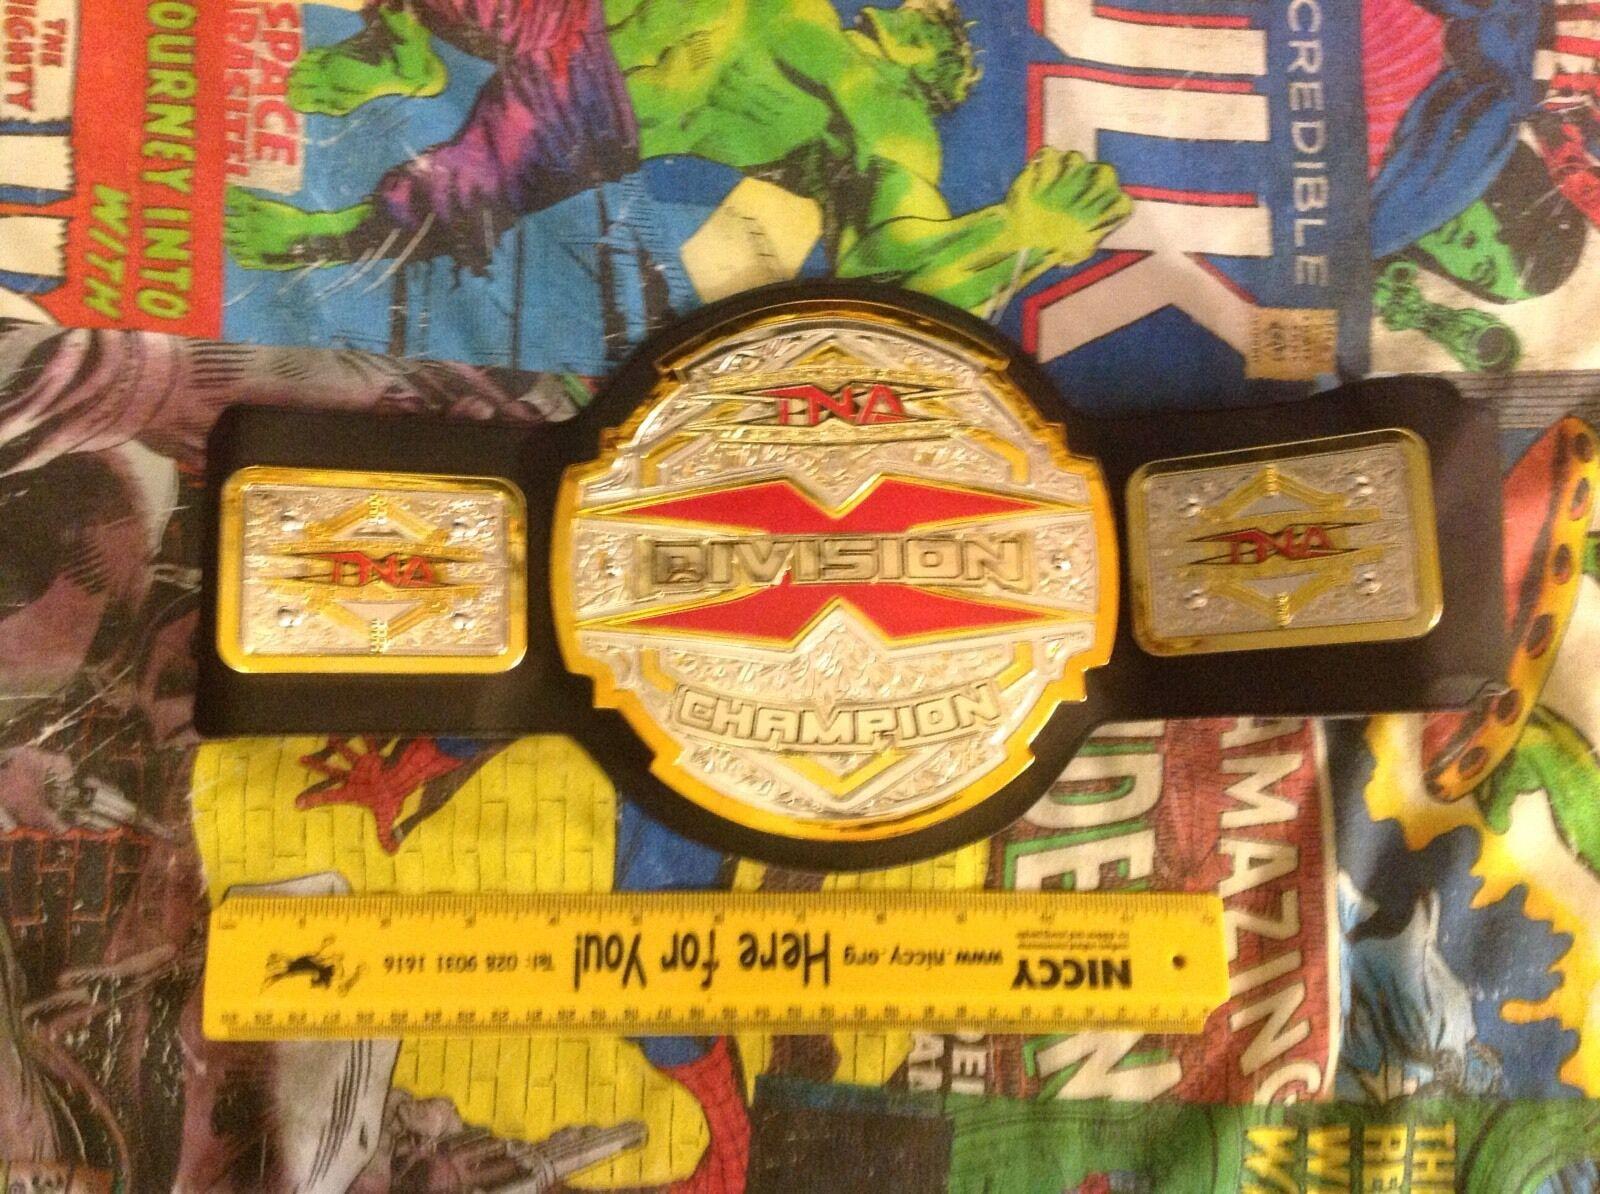 TNA X DIVISION Championship REPLICA Cintura 2010 Jakks Pacific-MOLTO RARO